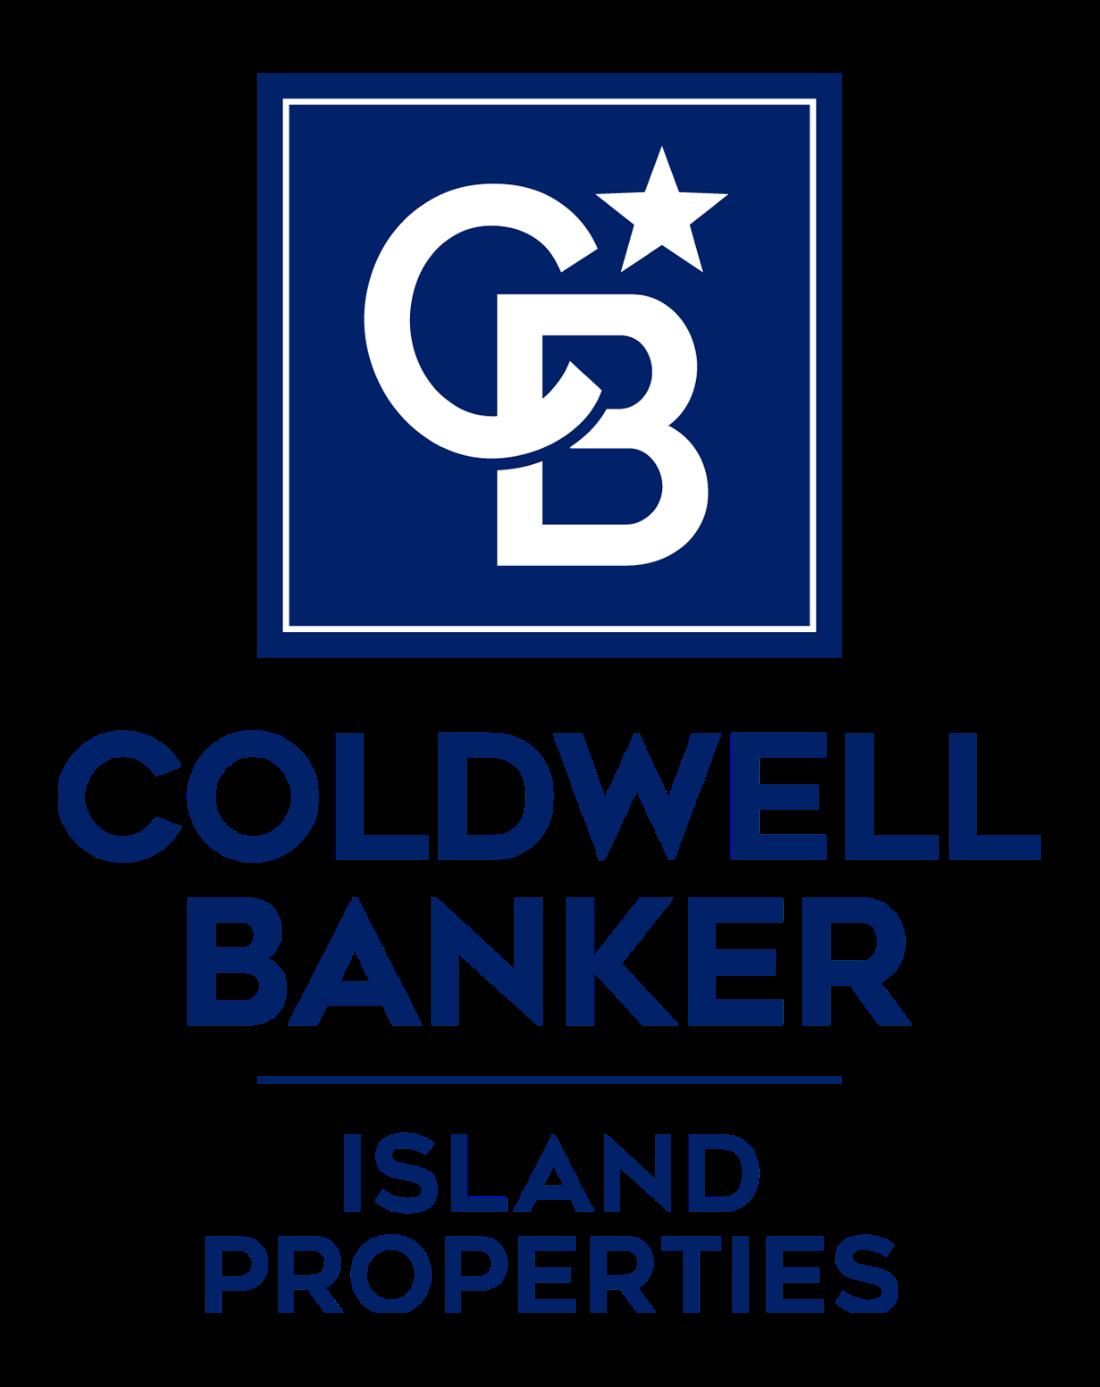 Patricia E. Kelley - Coldwell Banker Island Properties Logo